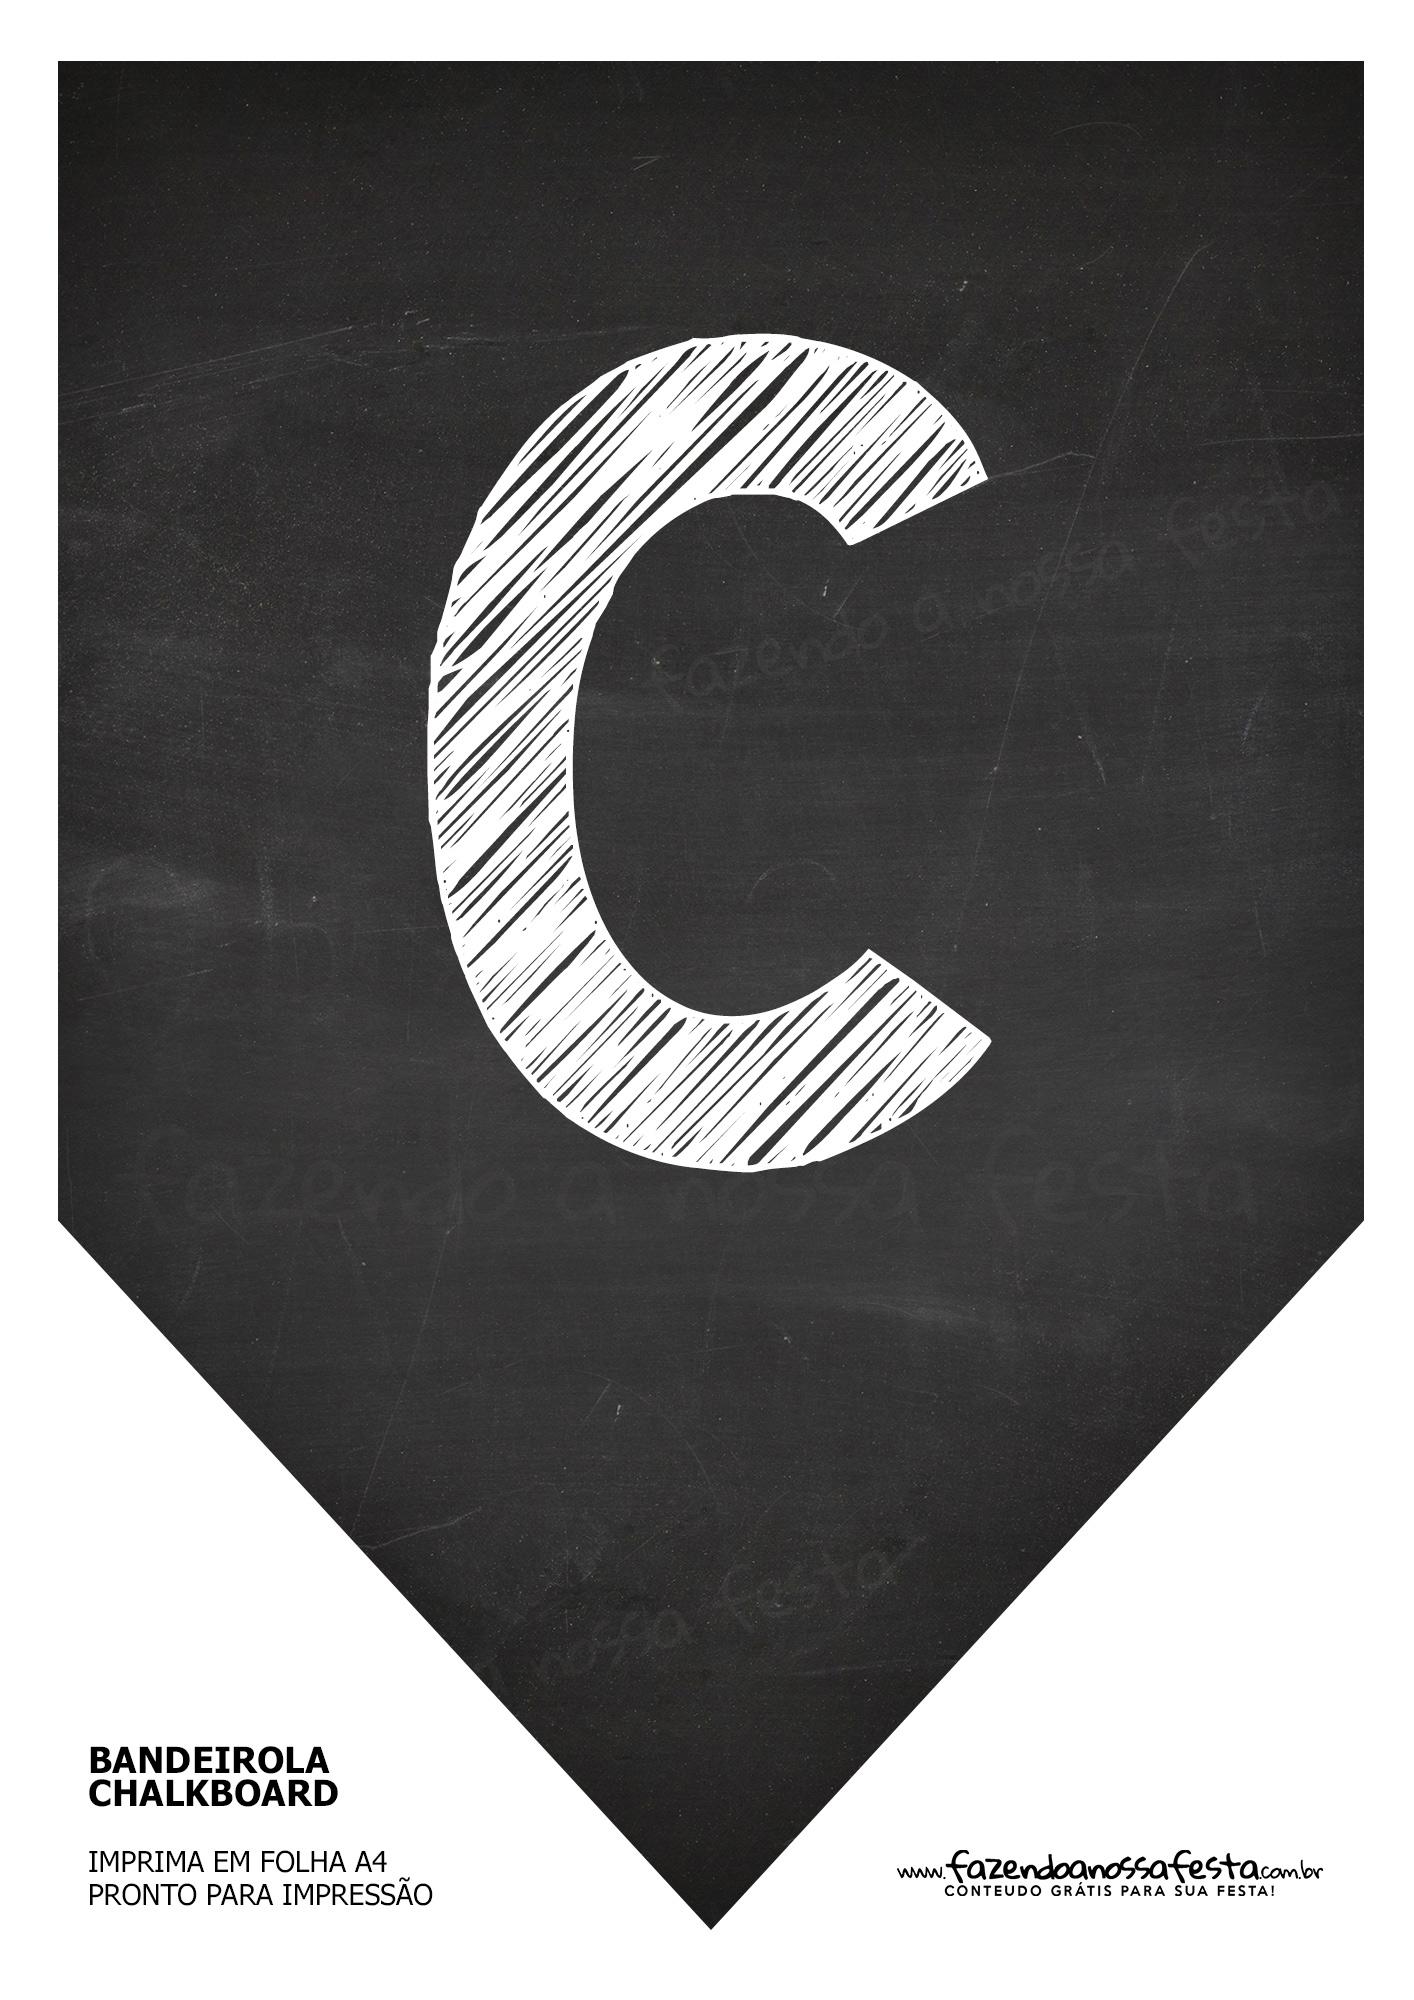 Bandeirola Chalkboard C